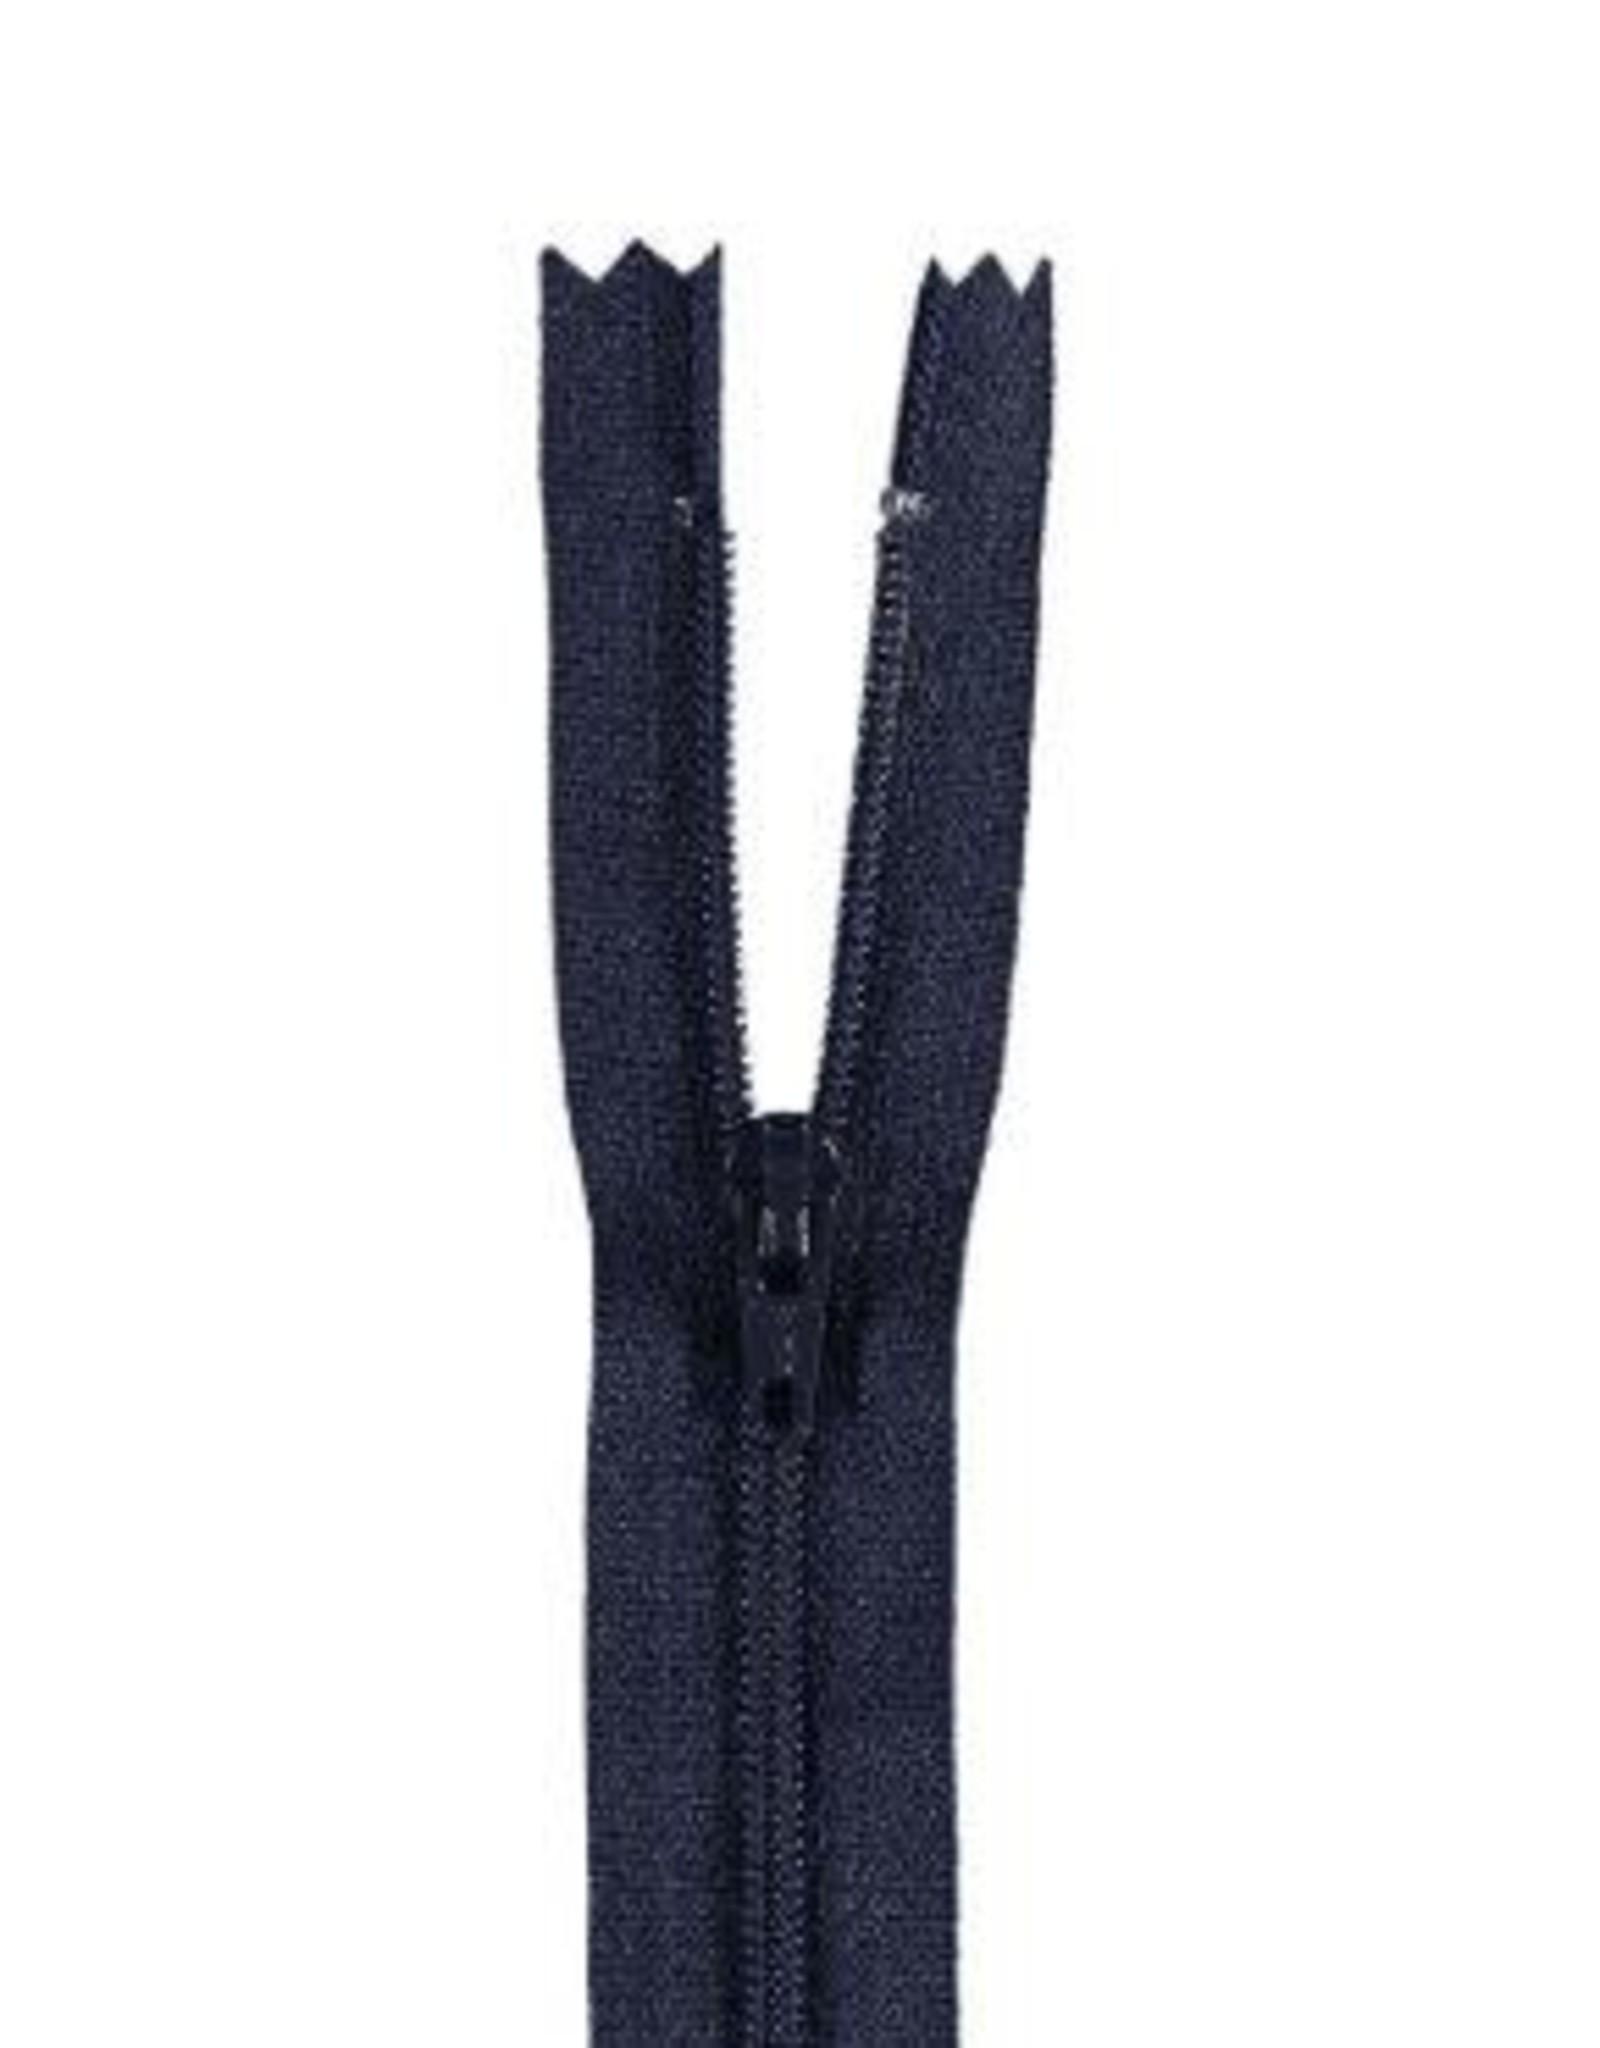 YKK Spiraalrits niet-DB 3mm d. blauw gr 168-40cm